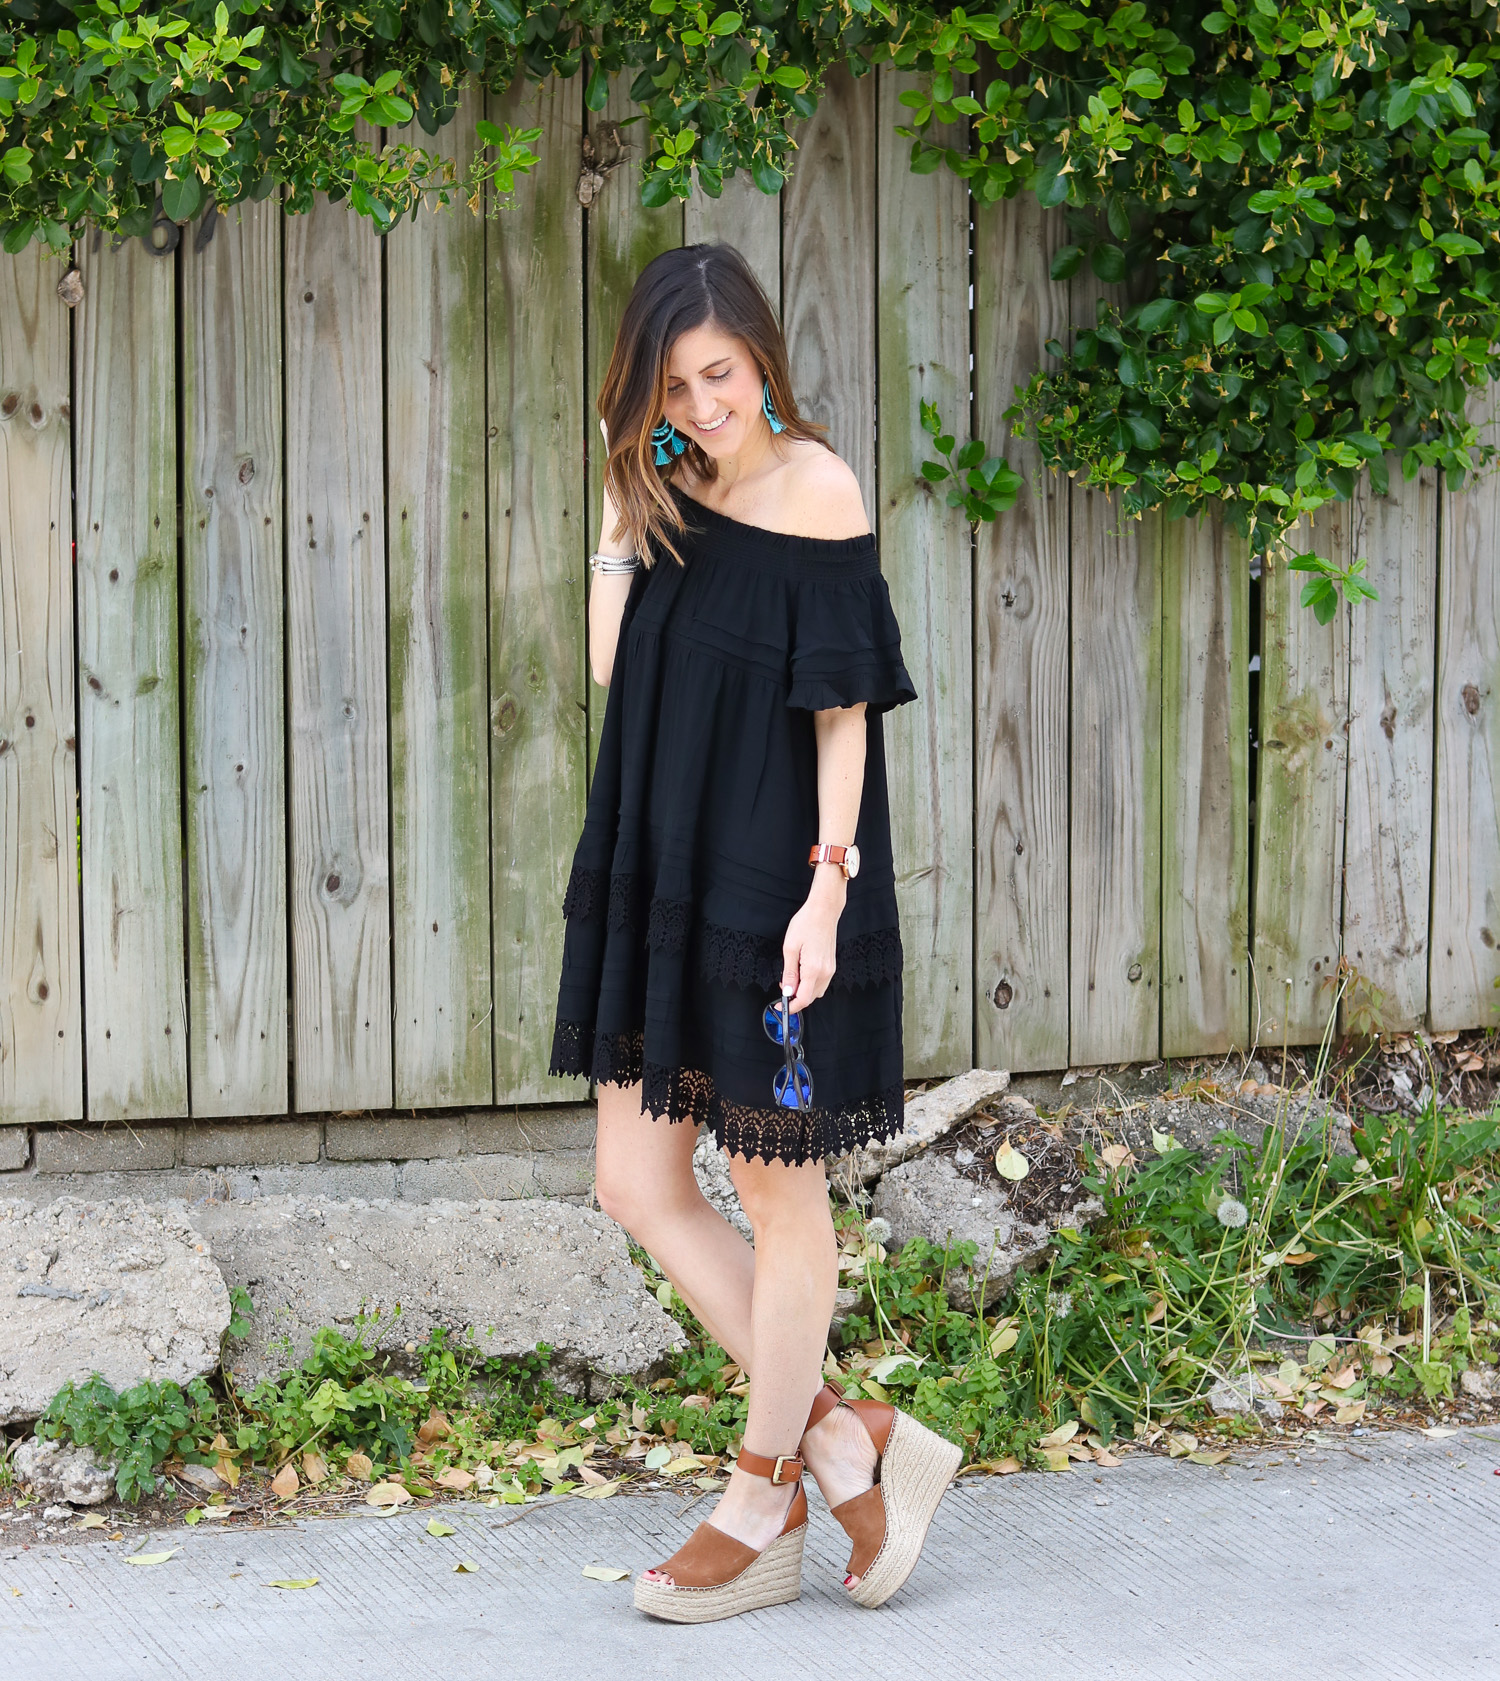 Black Off the Shoulder Dress @cobaltchronicle